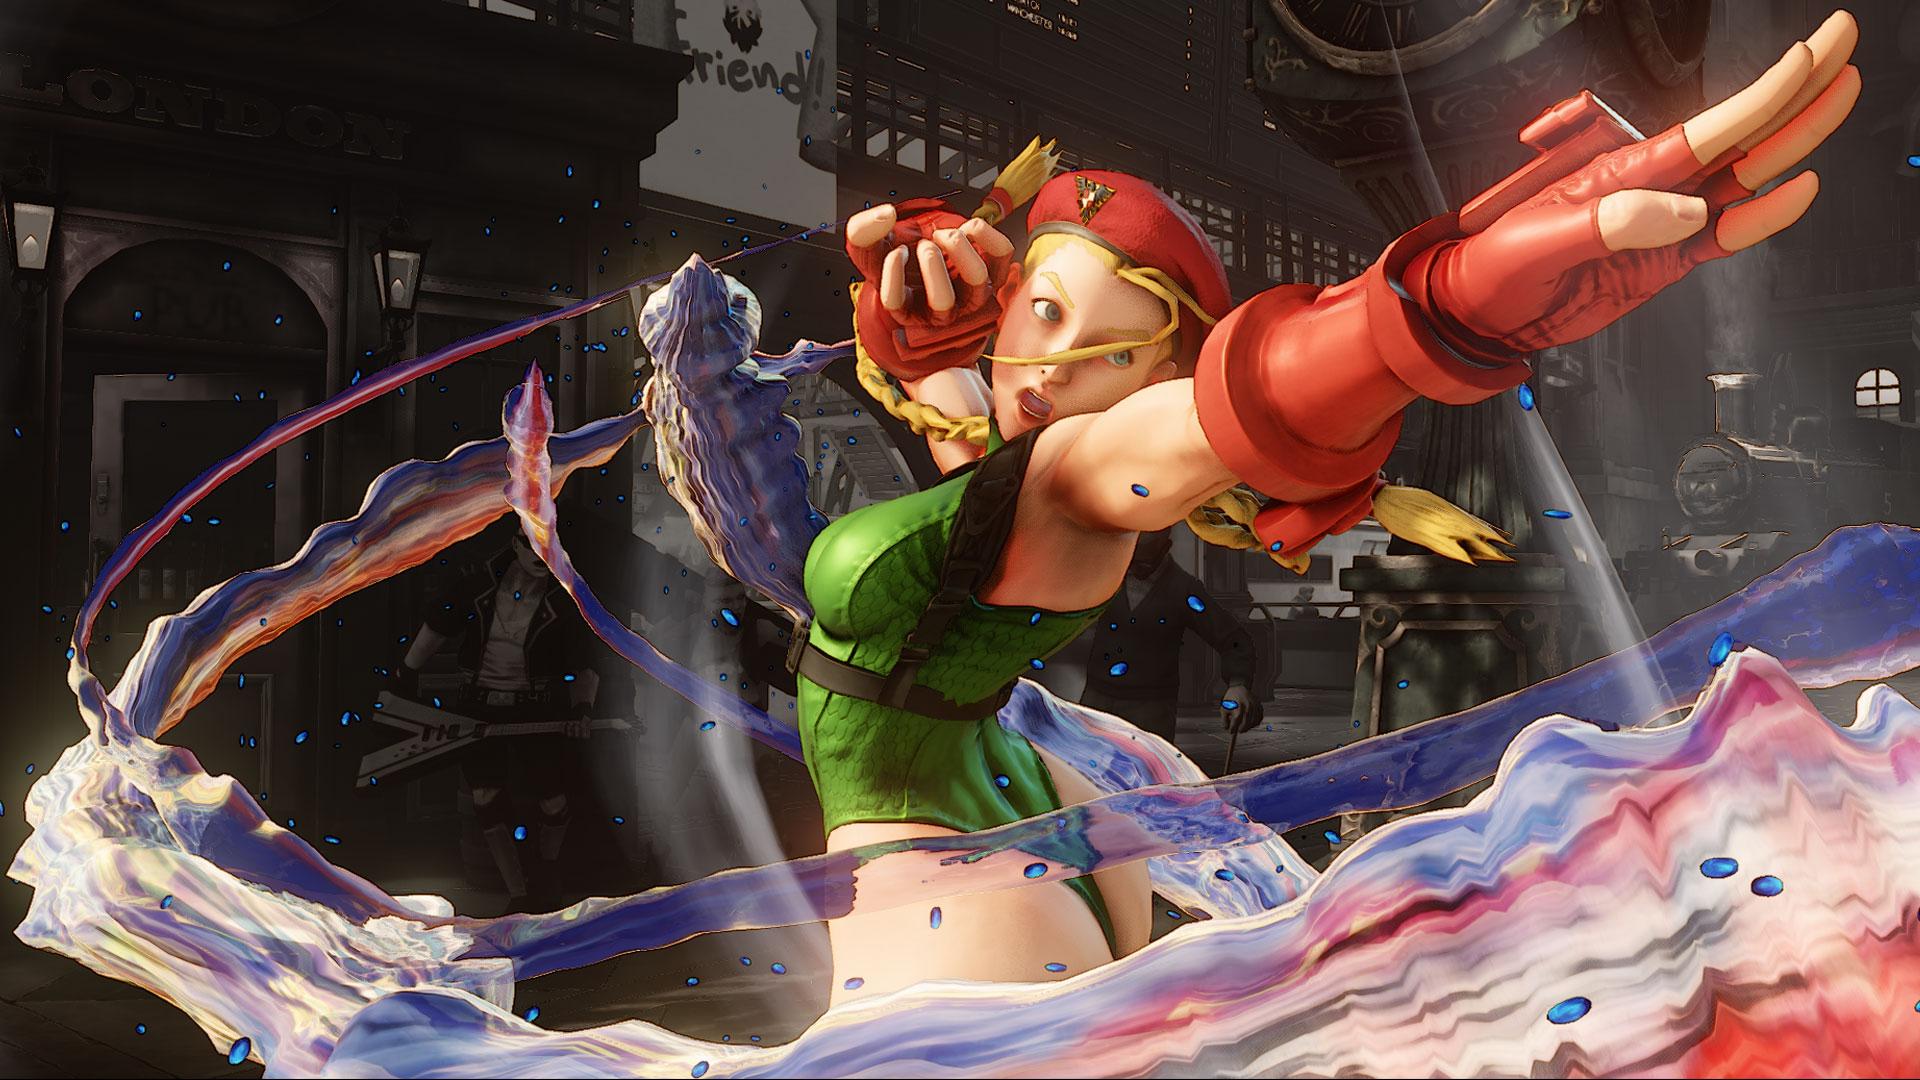 Cammy Street Fighter V HD Wallpaper   1920x1080   ID:58161